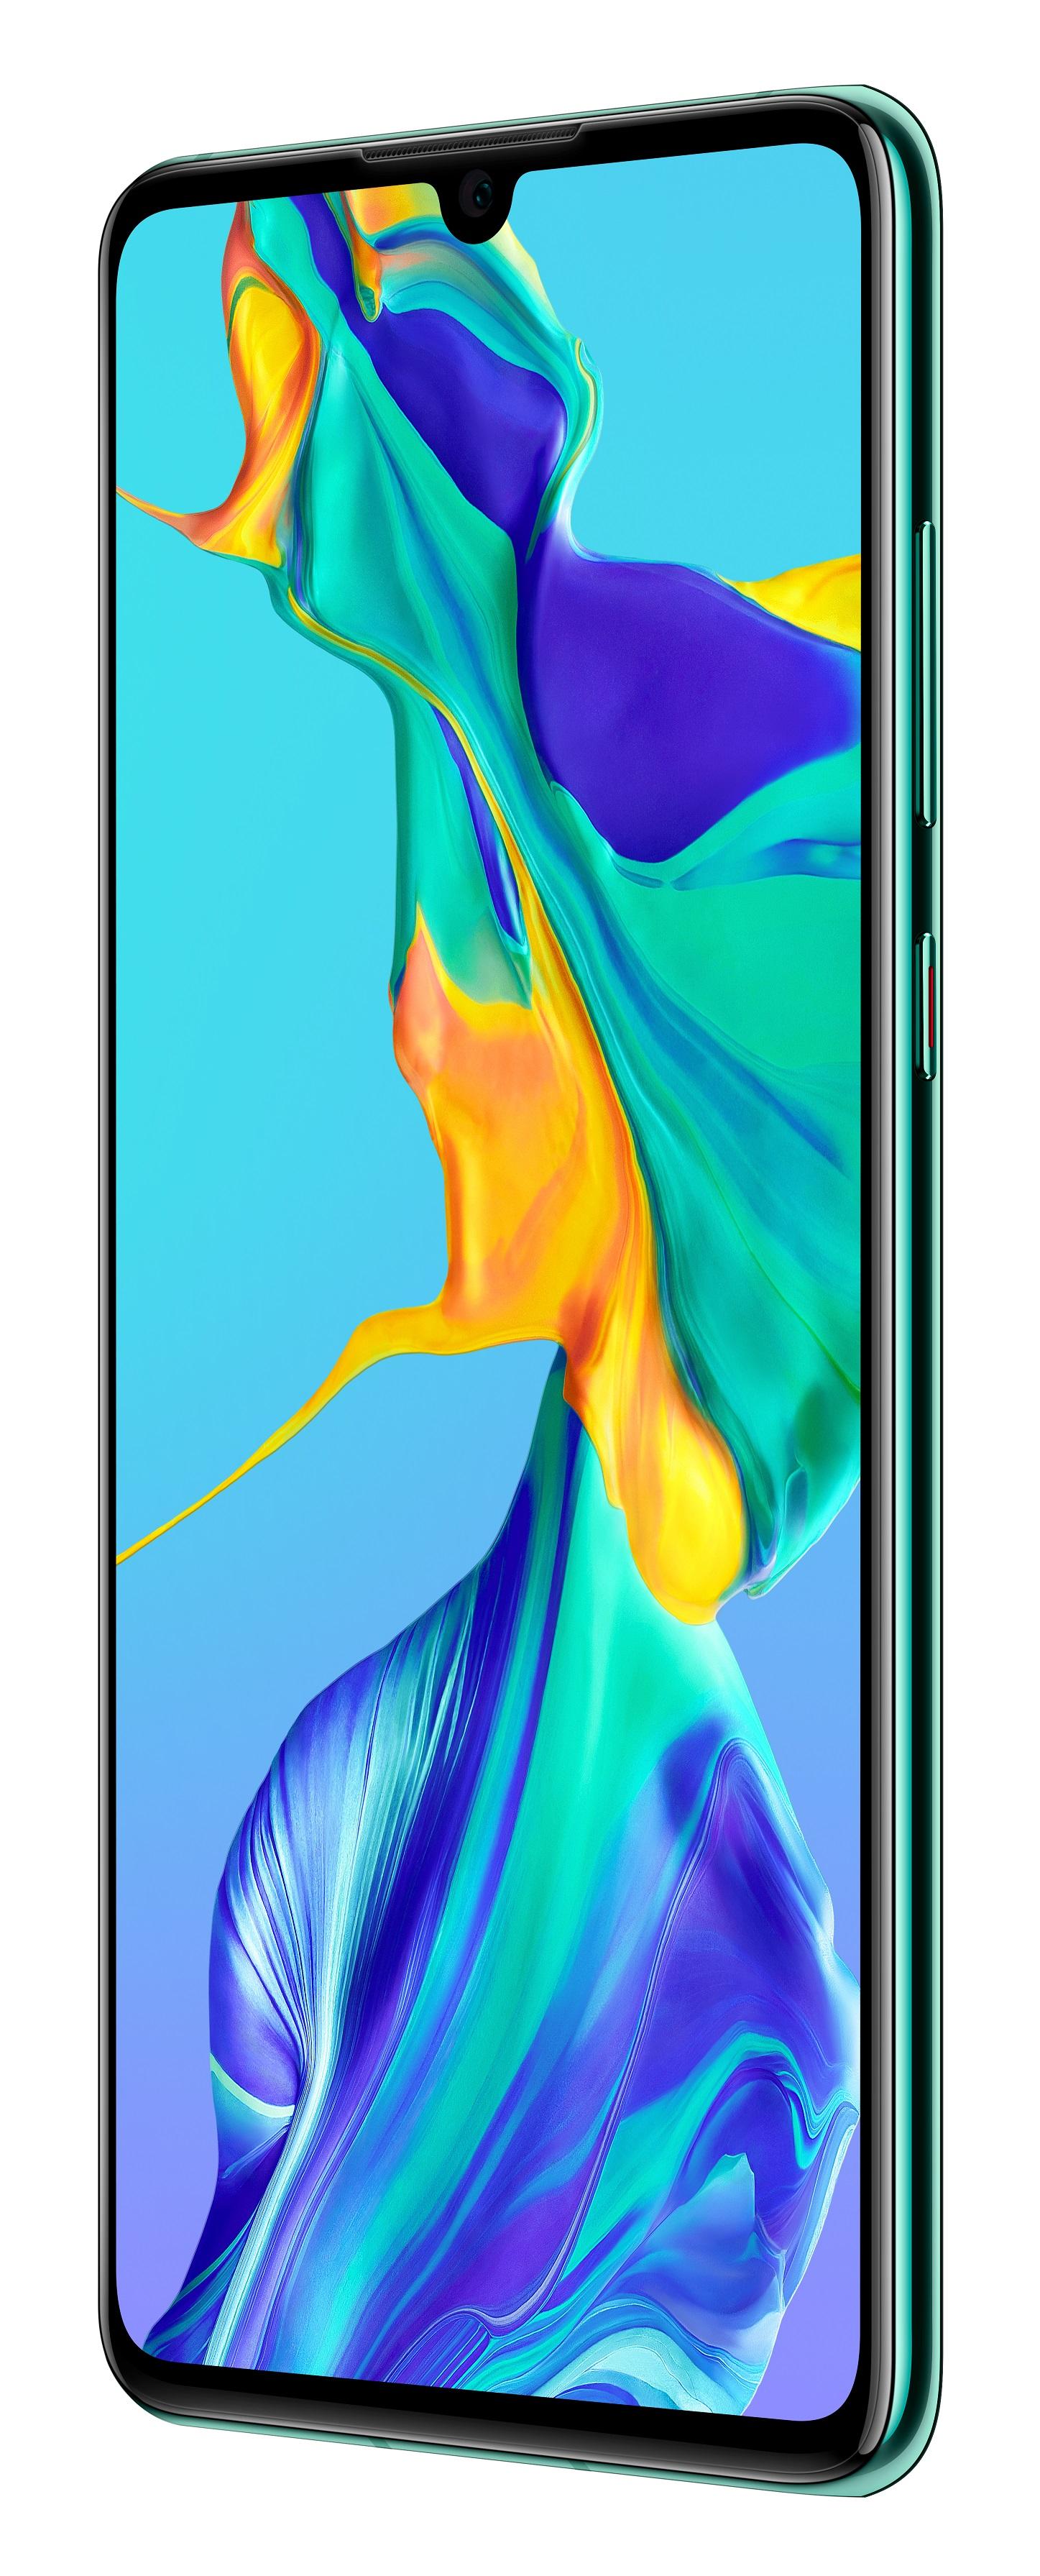 Huawei P30 twilight (Aurora) Telekom - Dual SIM, Android 9.0, OLED, BRANDNEU